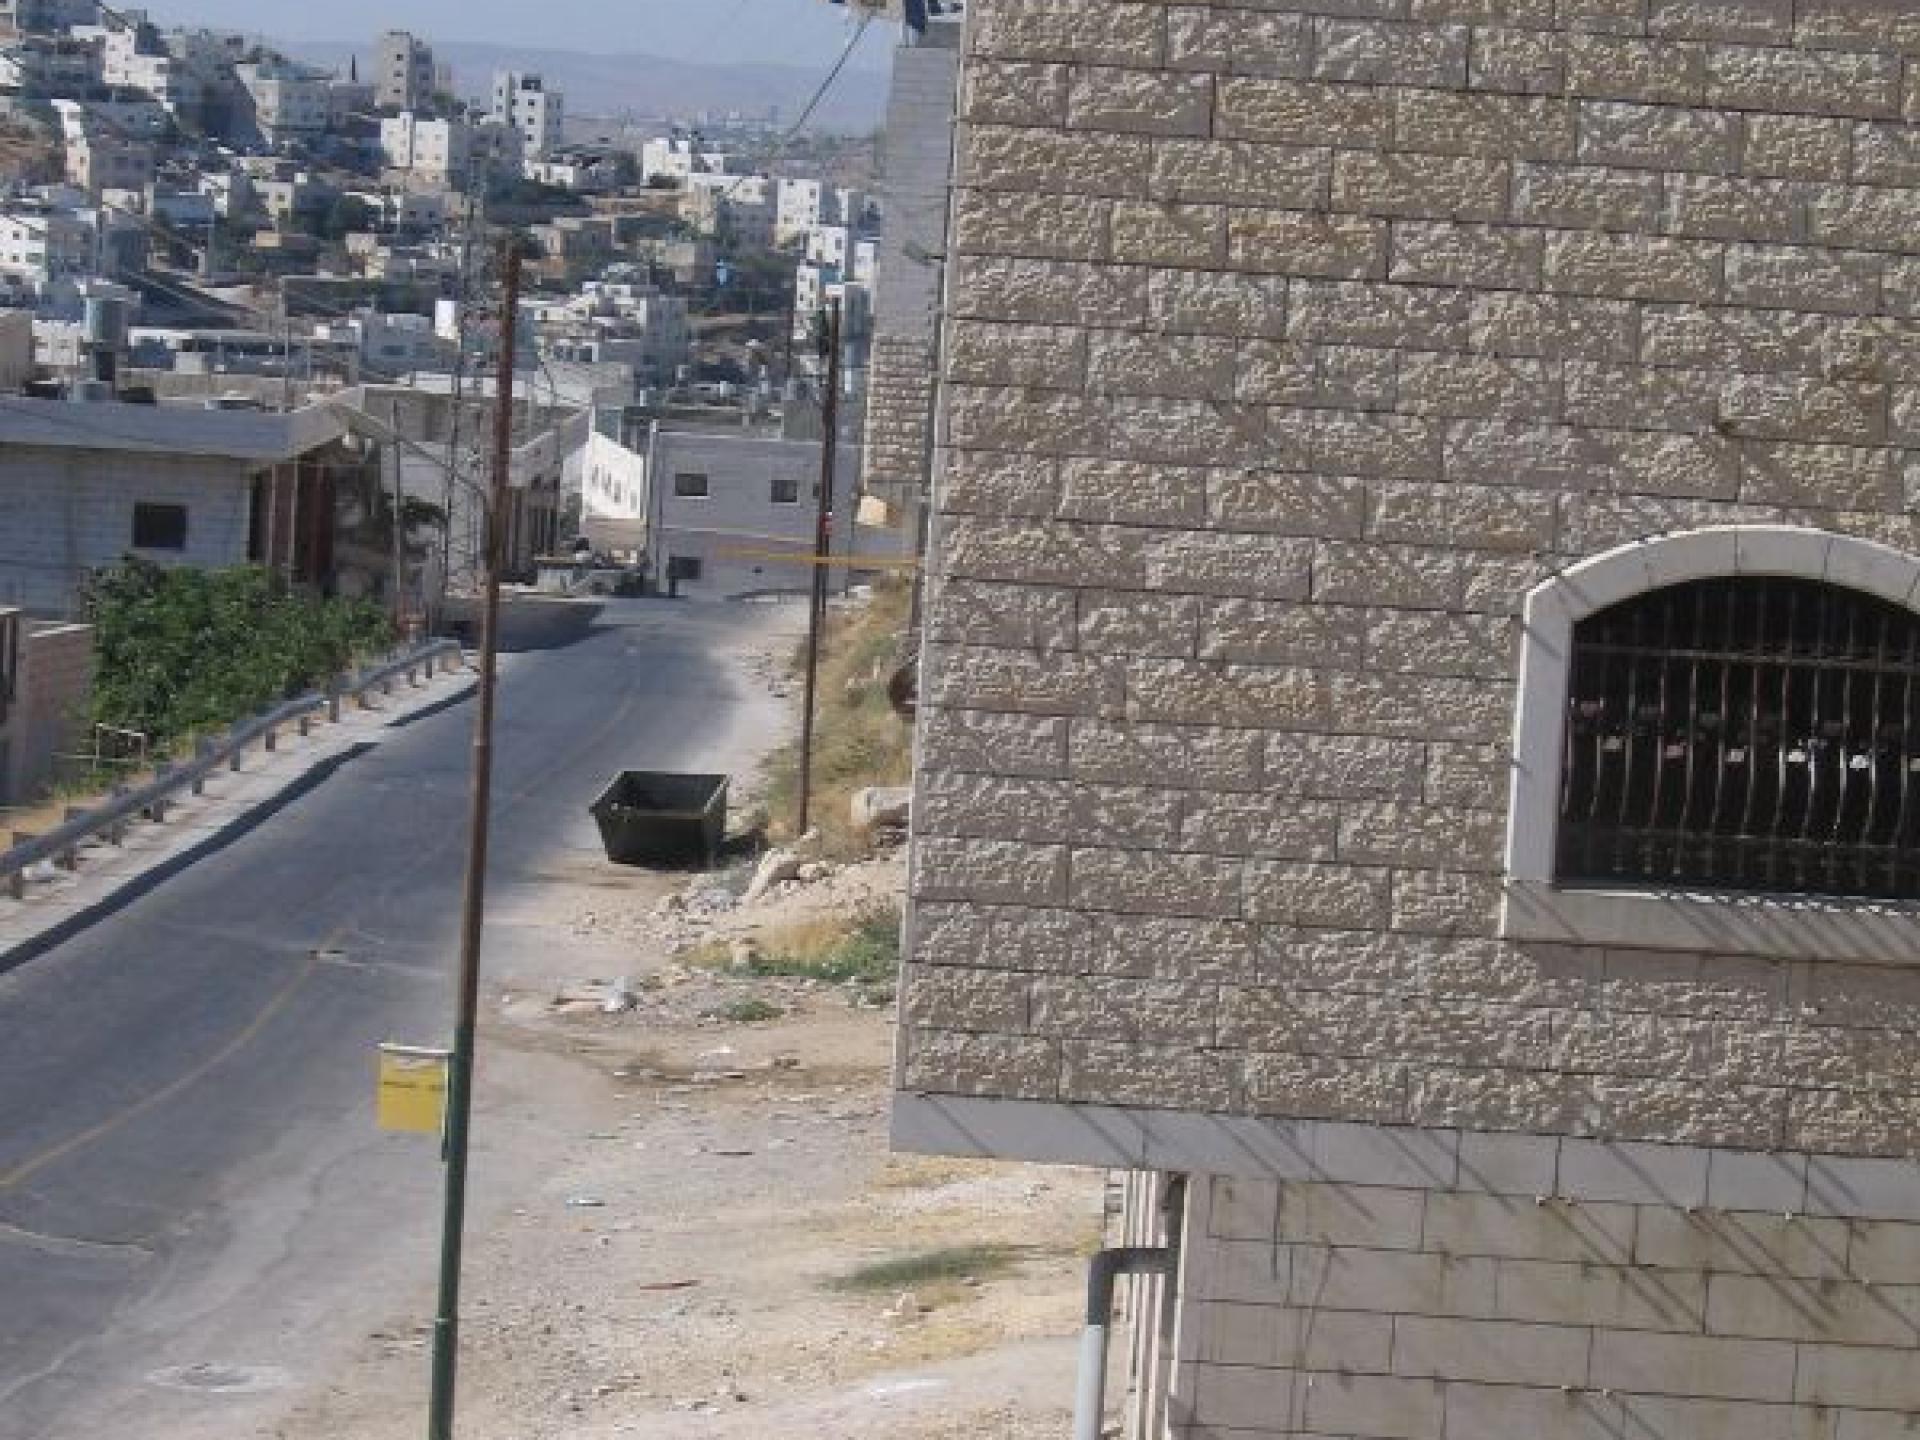 Hebron 09.07.07